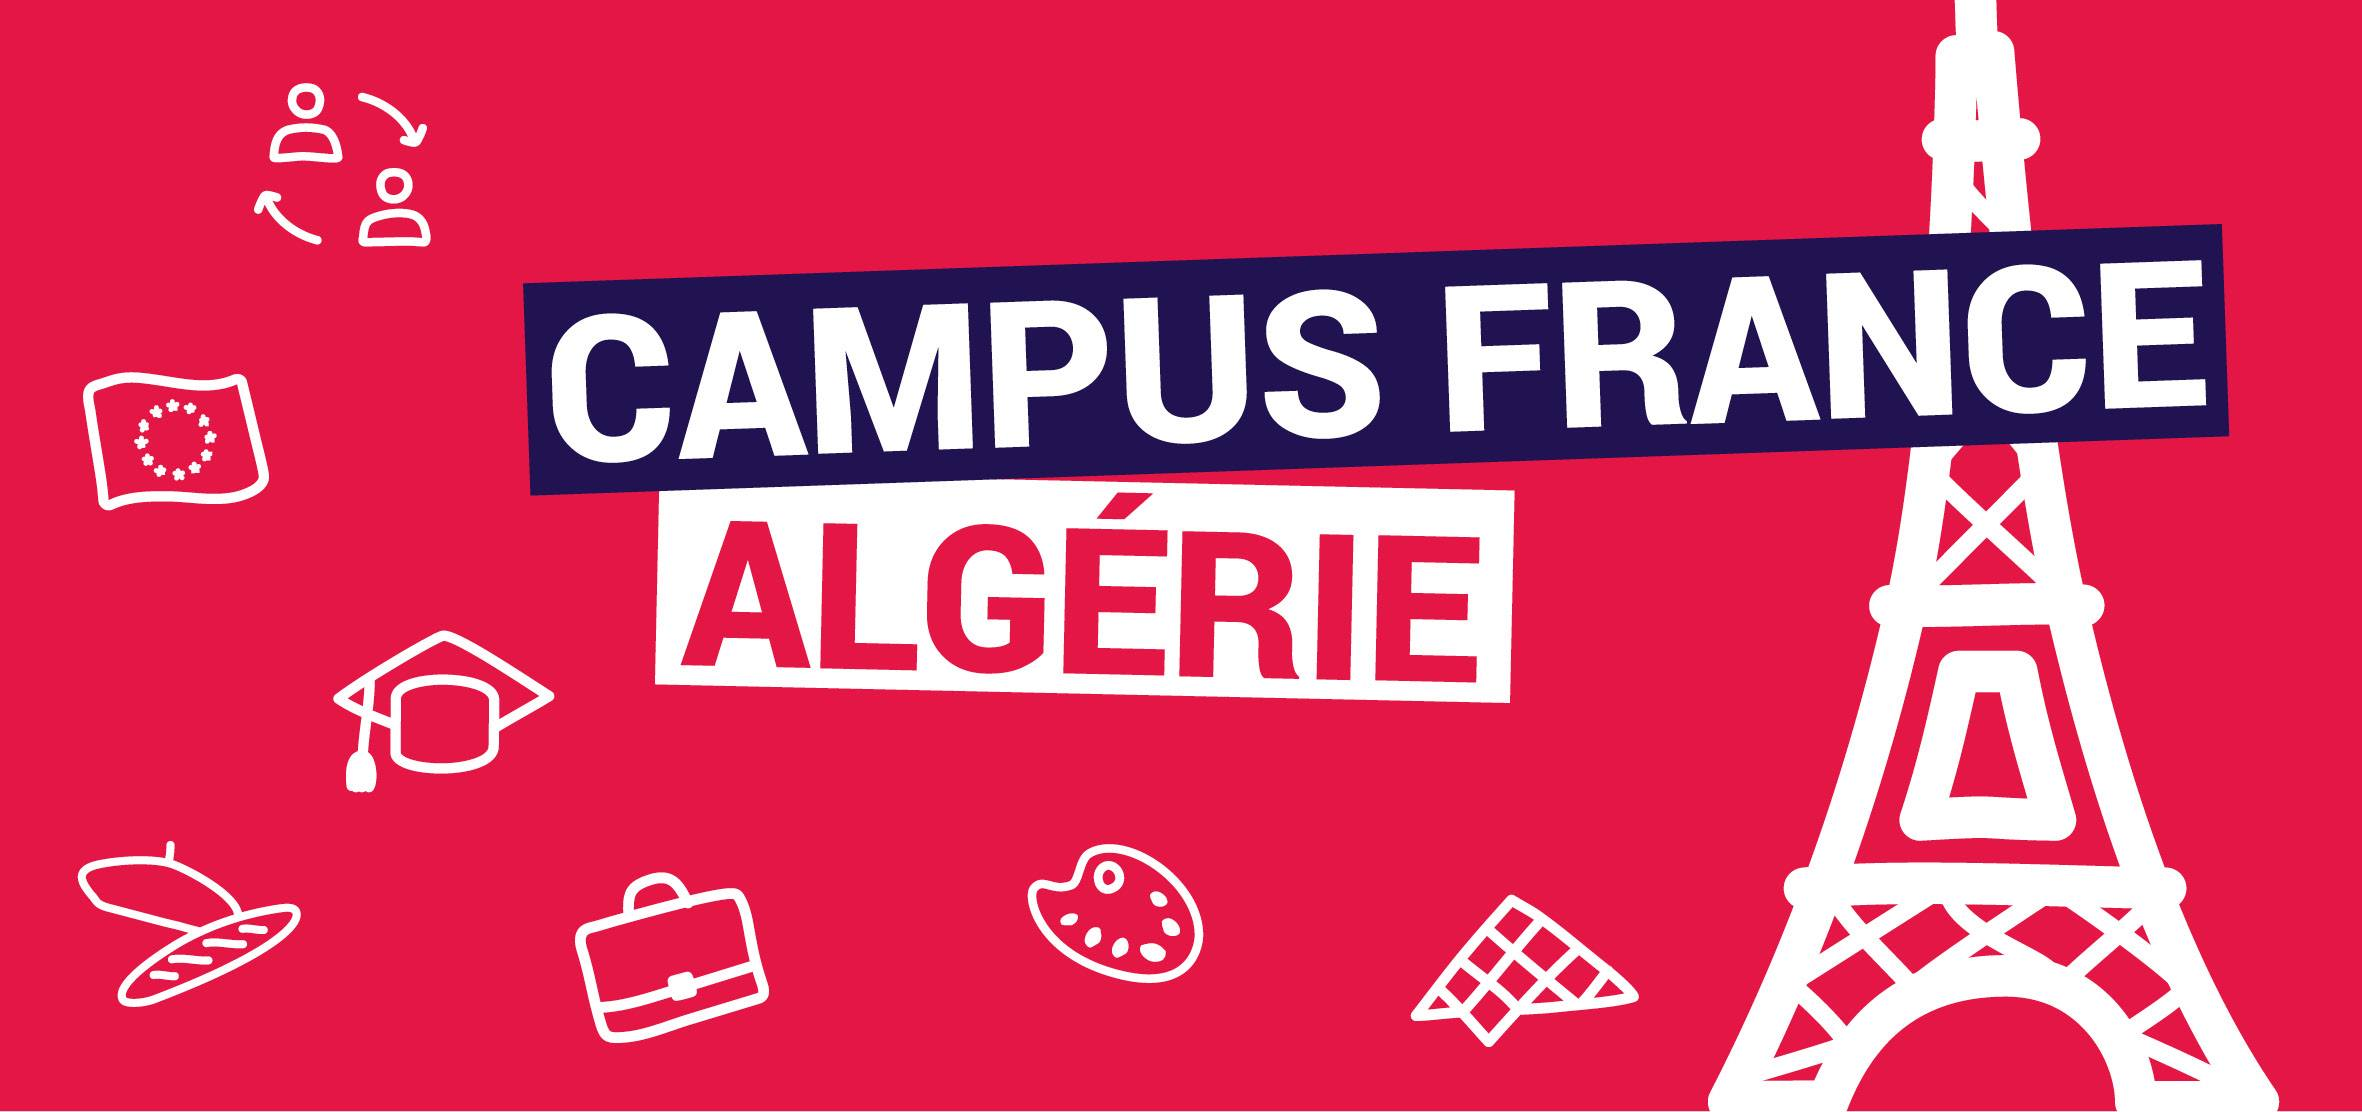 campus france algerie